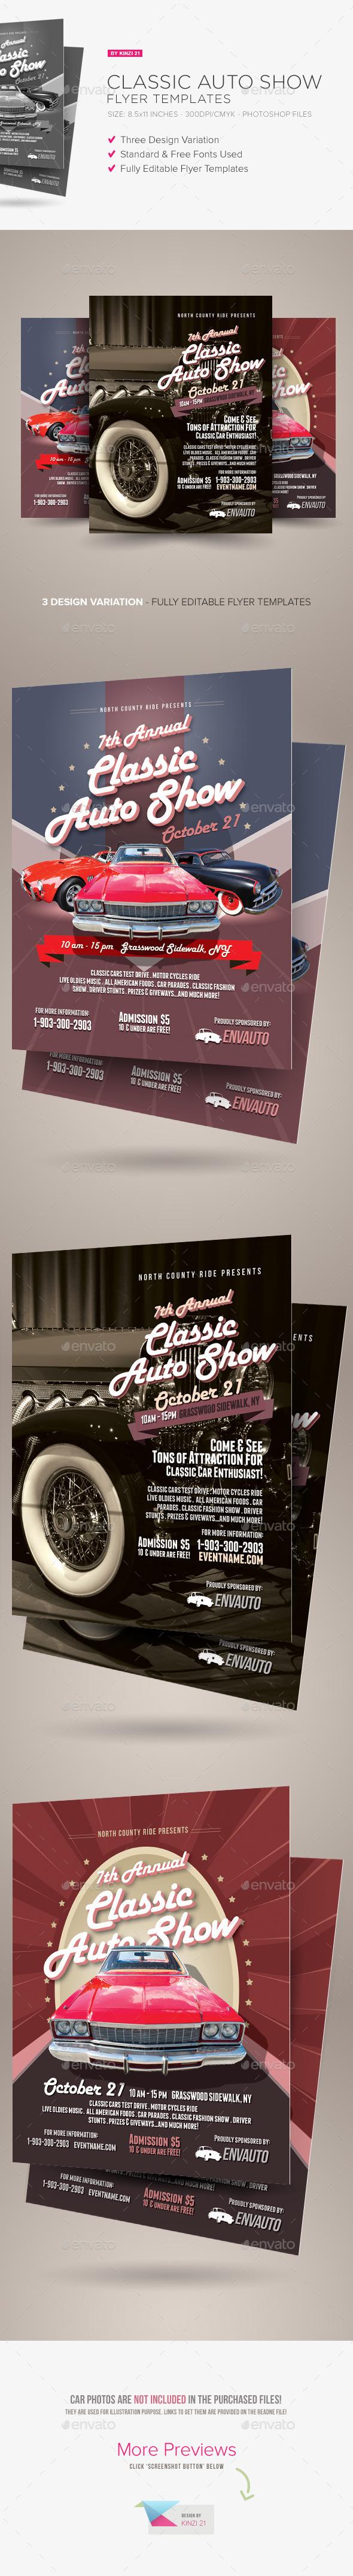 GraphicRiver Classic Auto Show Flyers 8829272